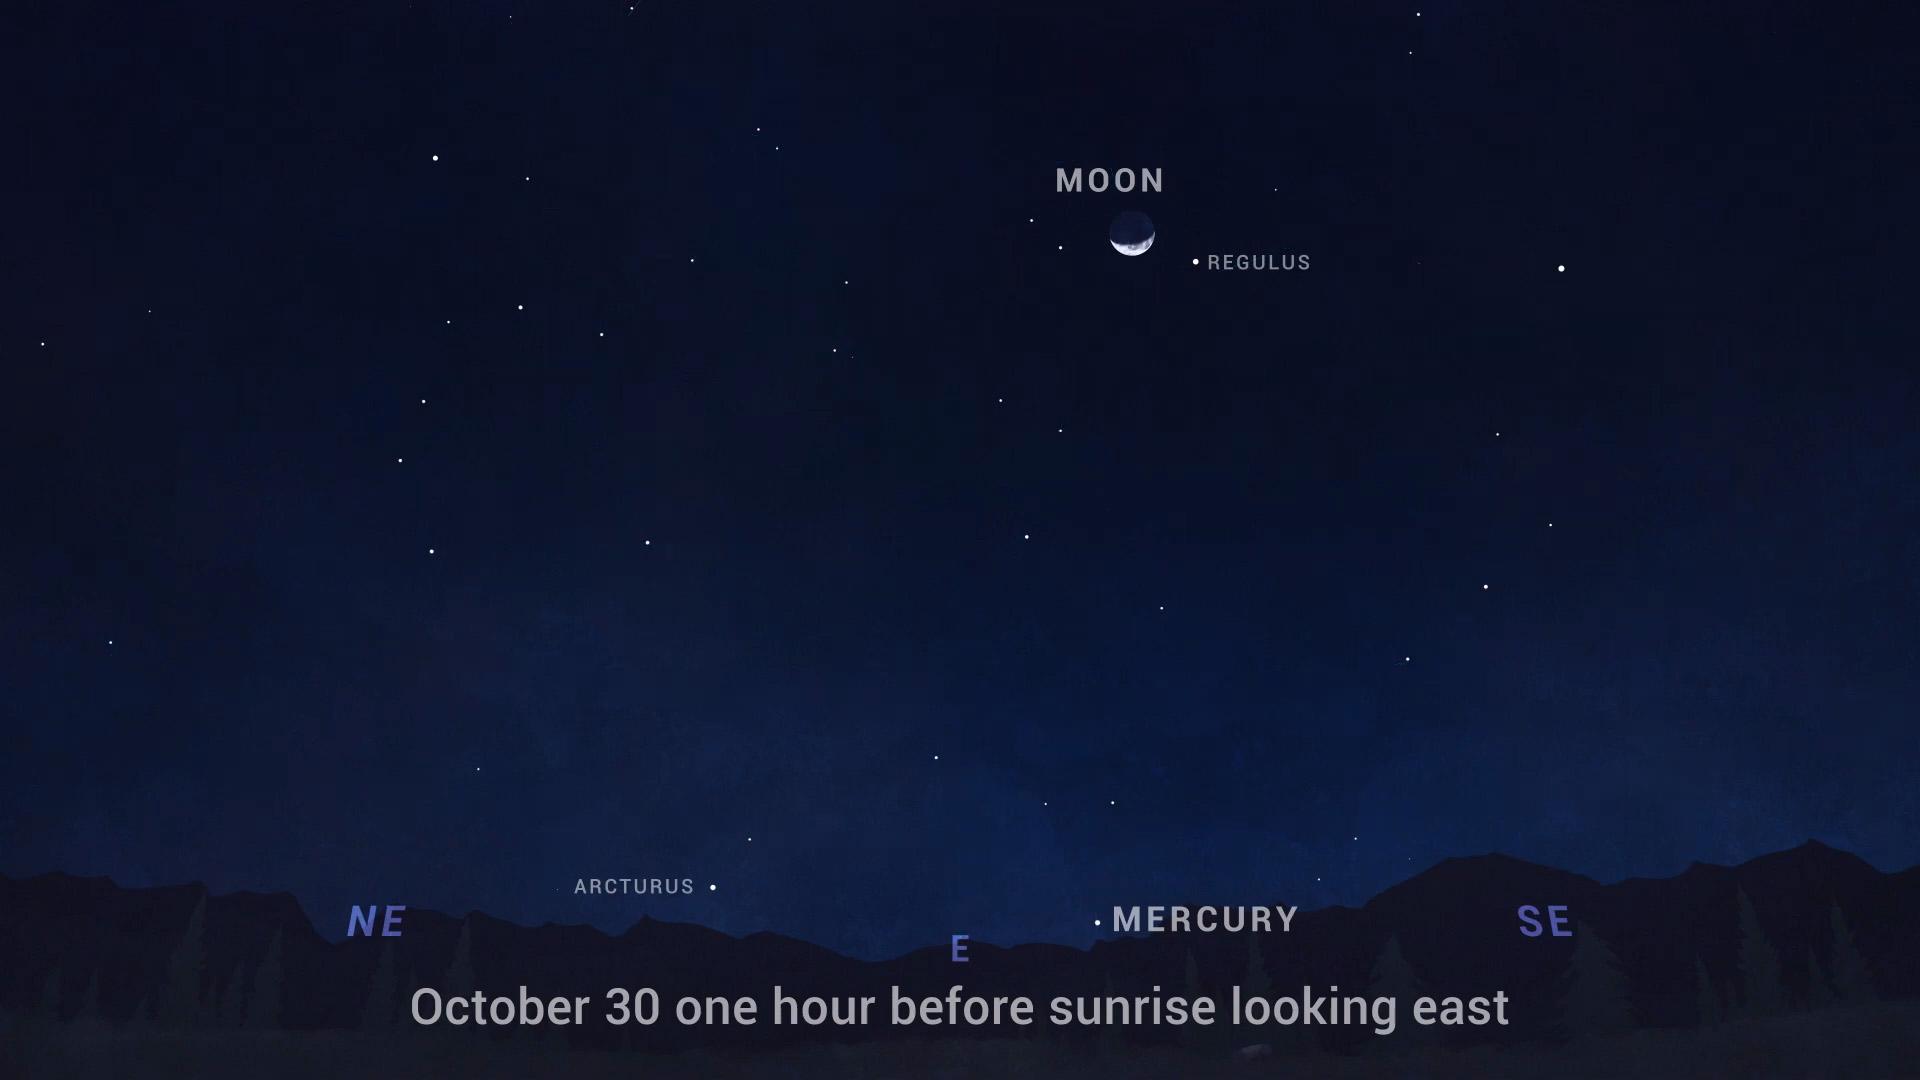 MoonRegulus_Oct30.jpg